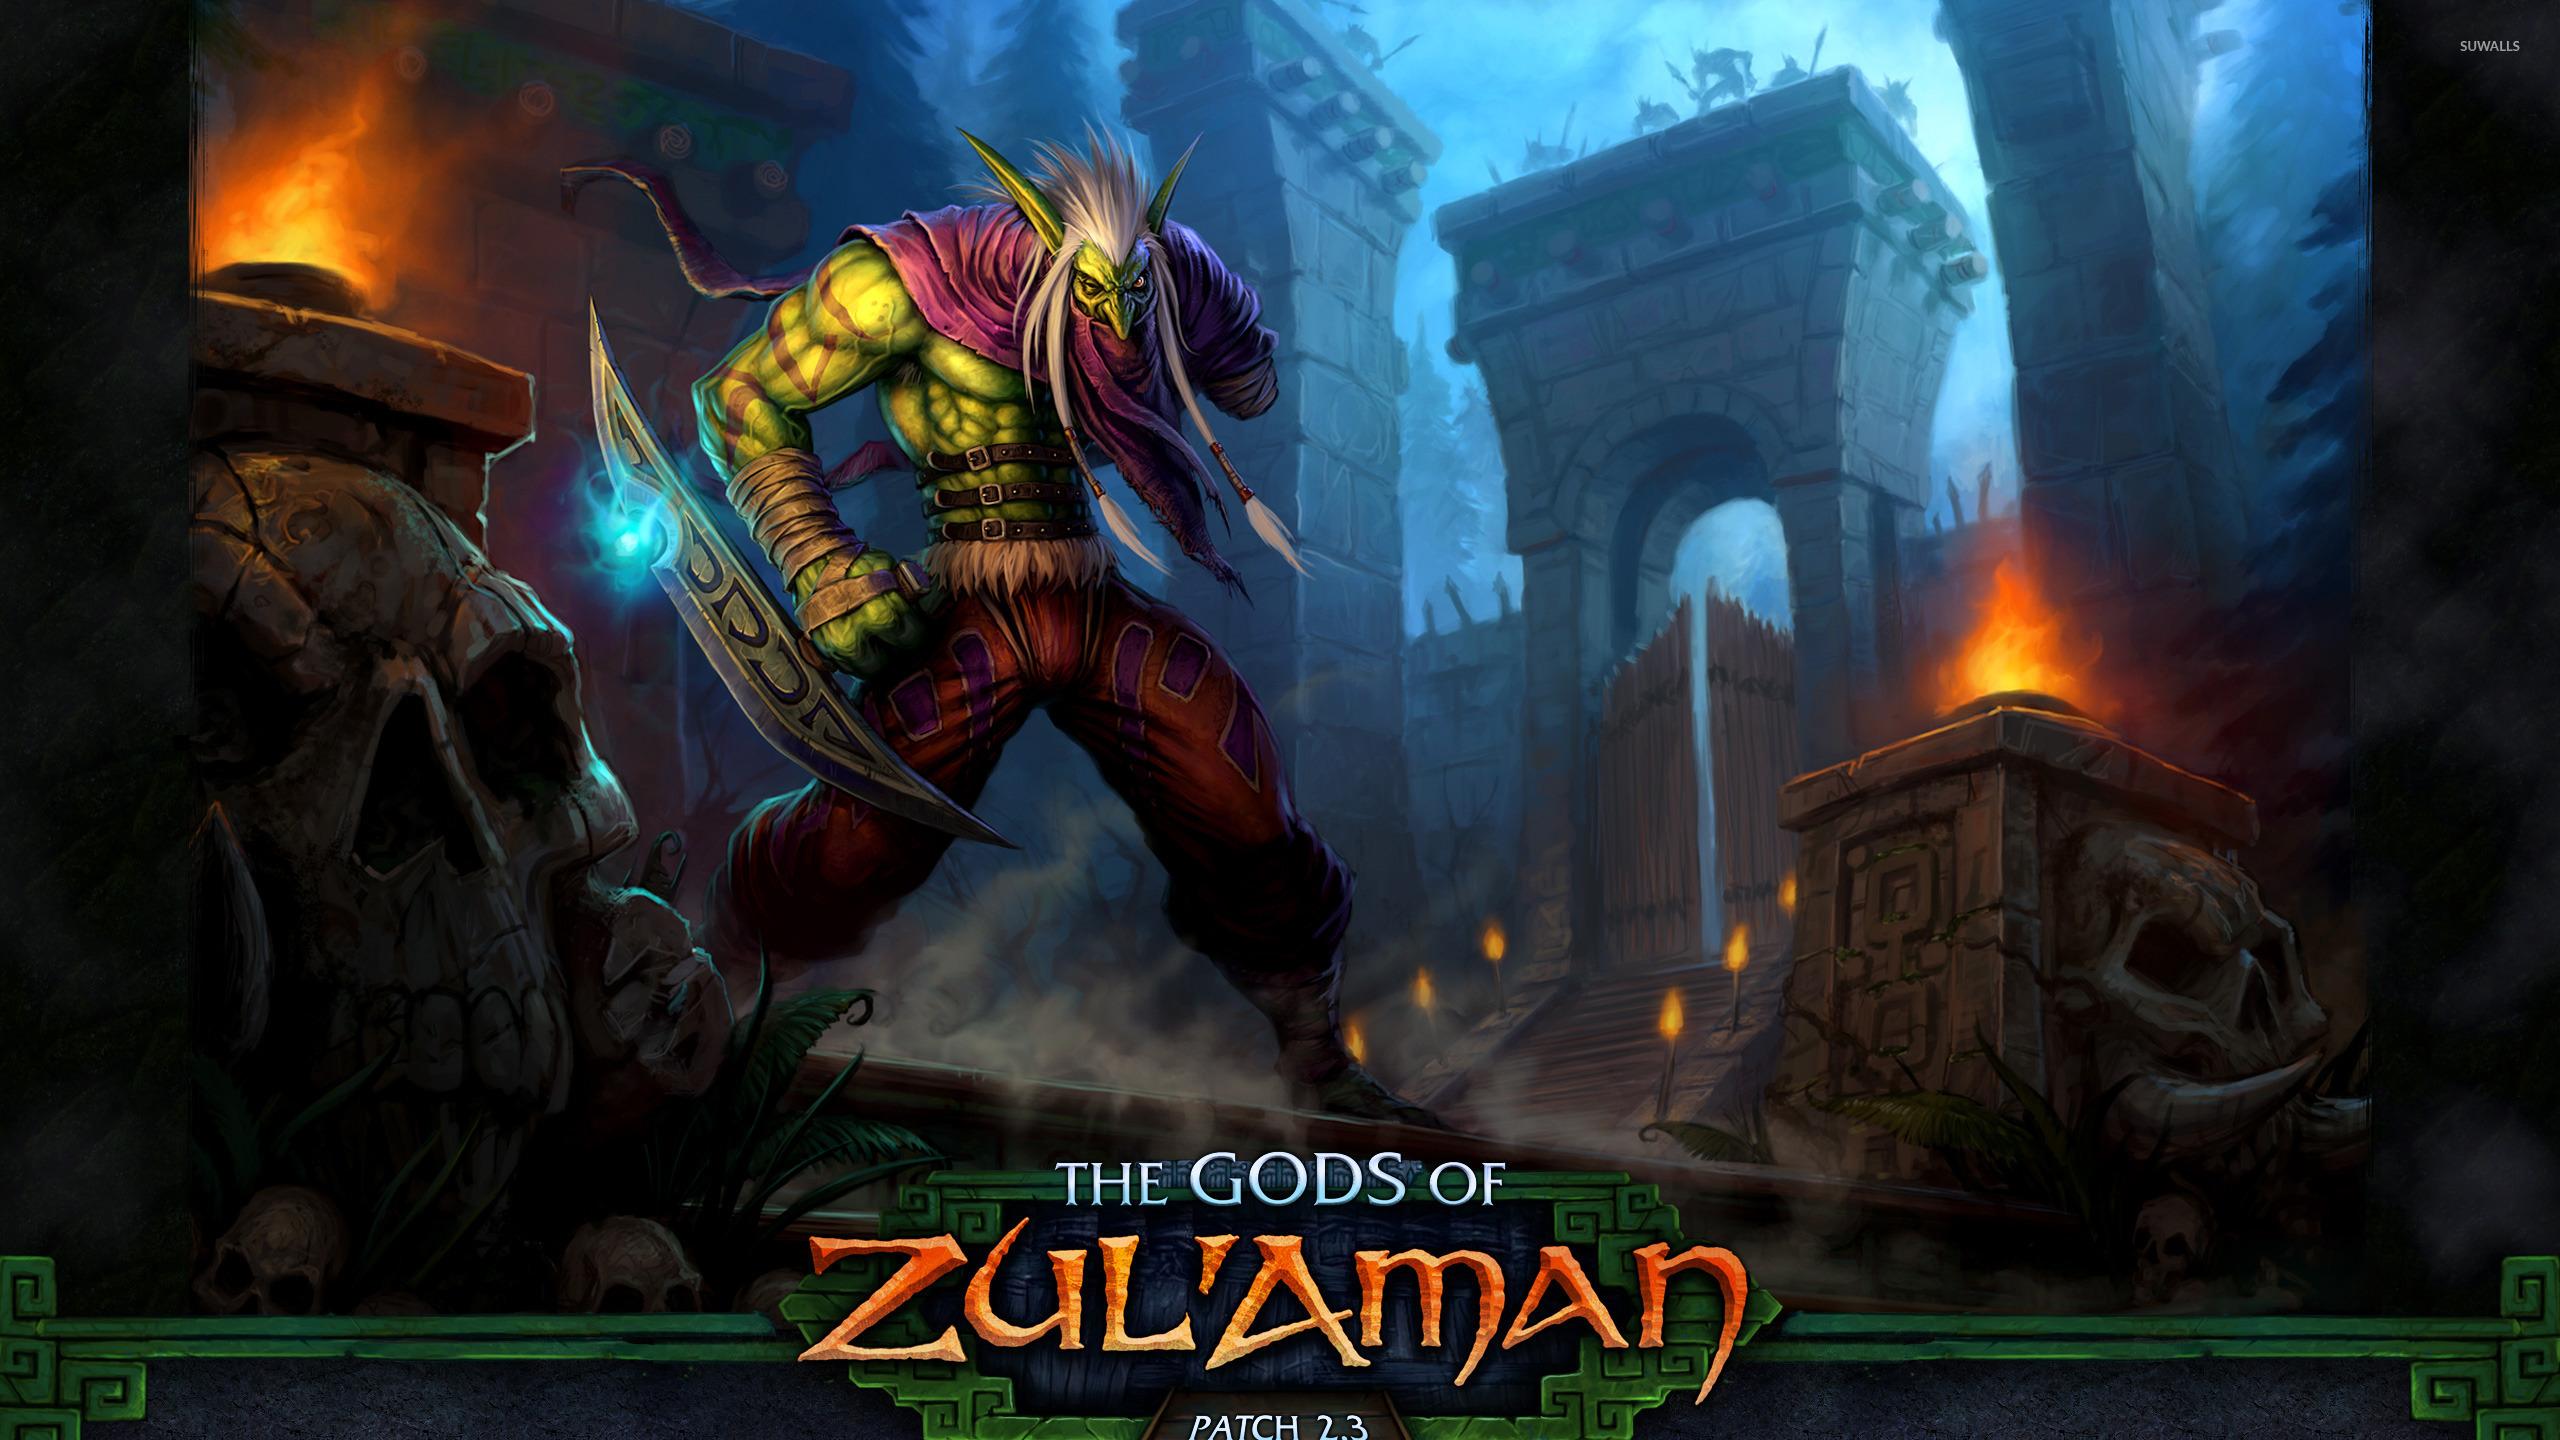 The Gods Of Zul Aman World Of Warcraft Wallpaper Game